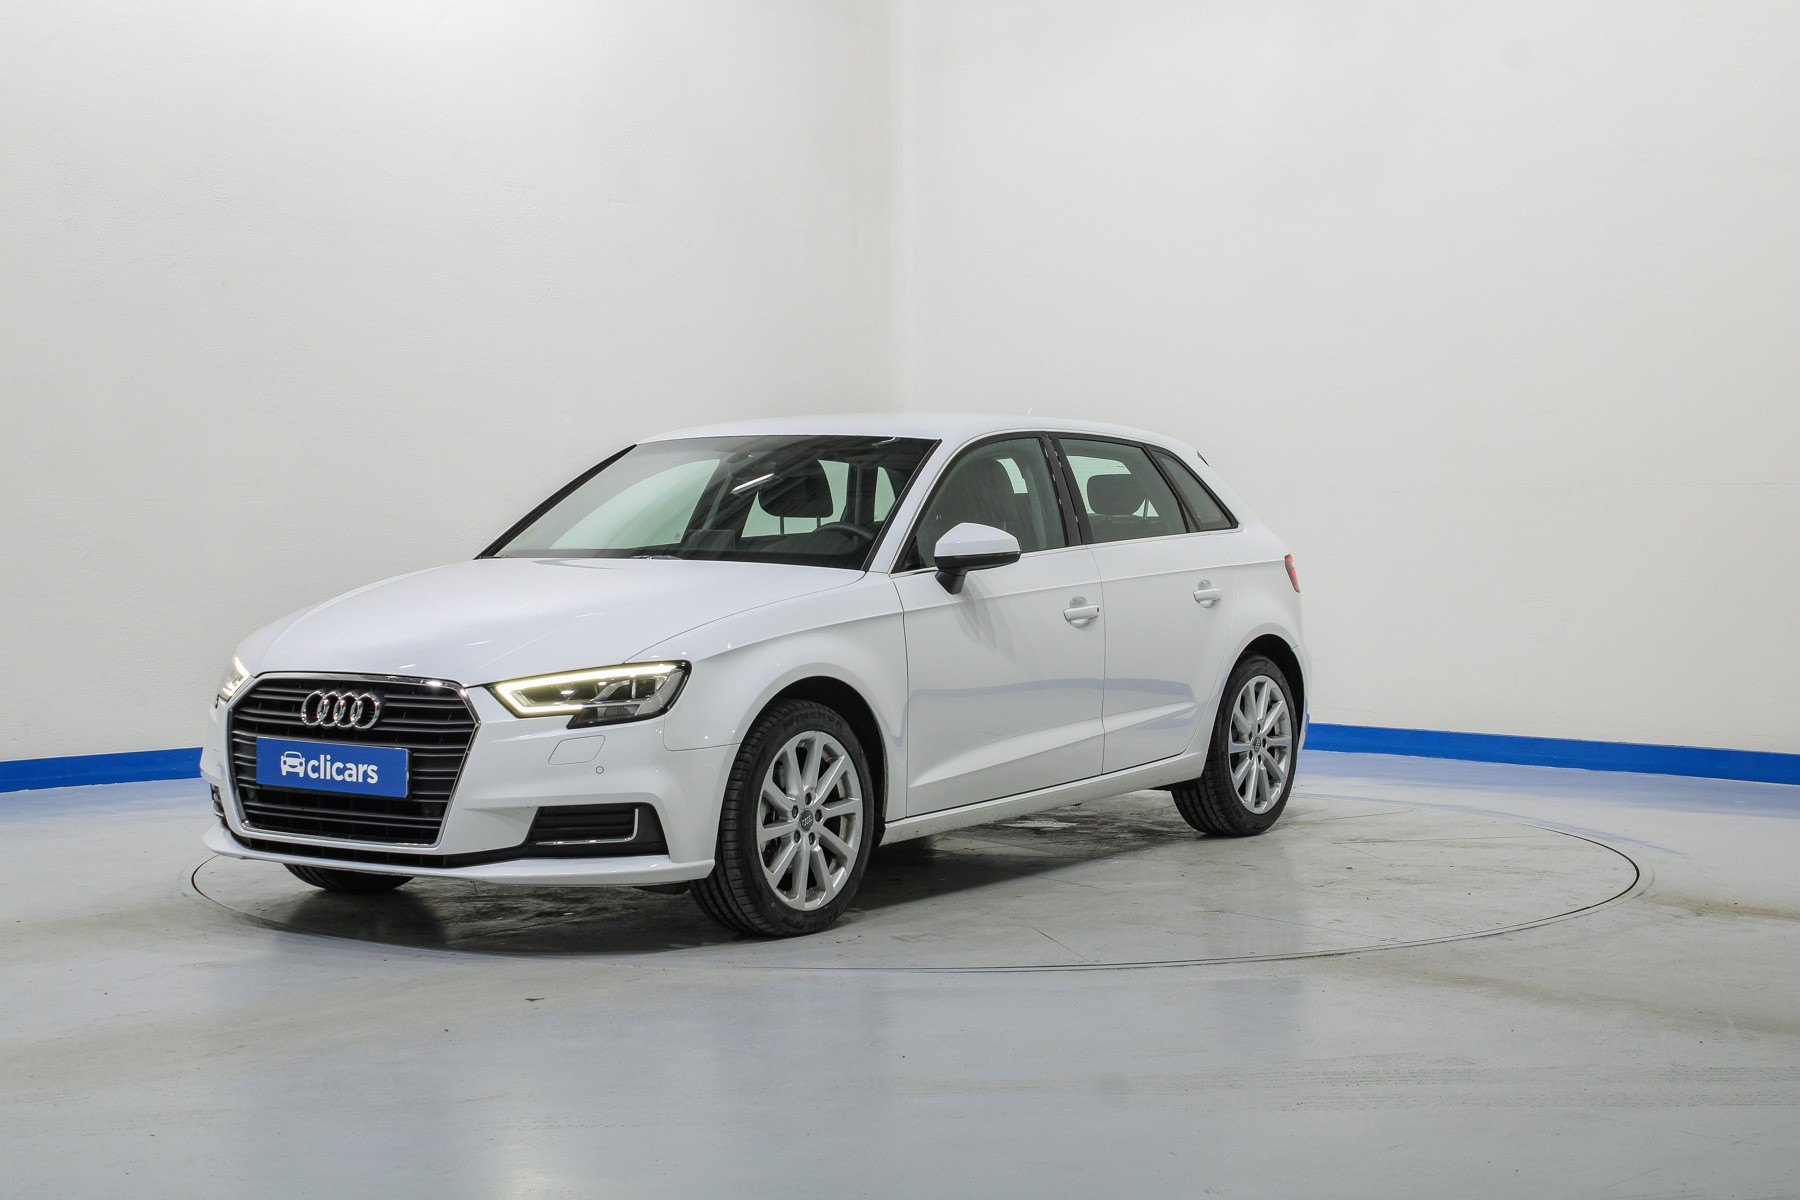 Audi A3 Gasolina Design 35 TFSI 110kW (150CV) Sportback 1